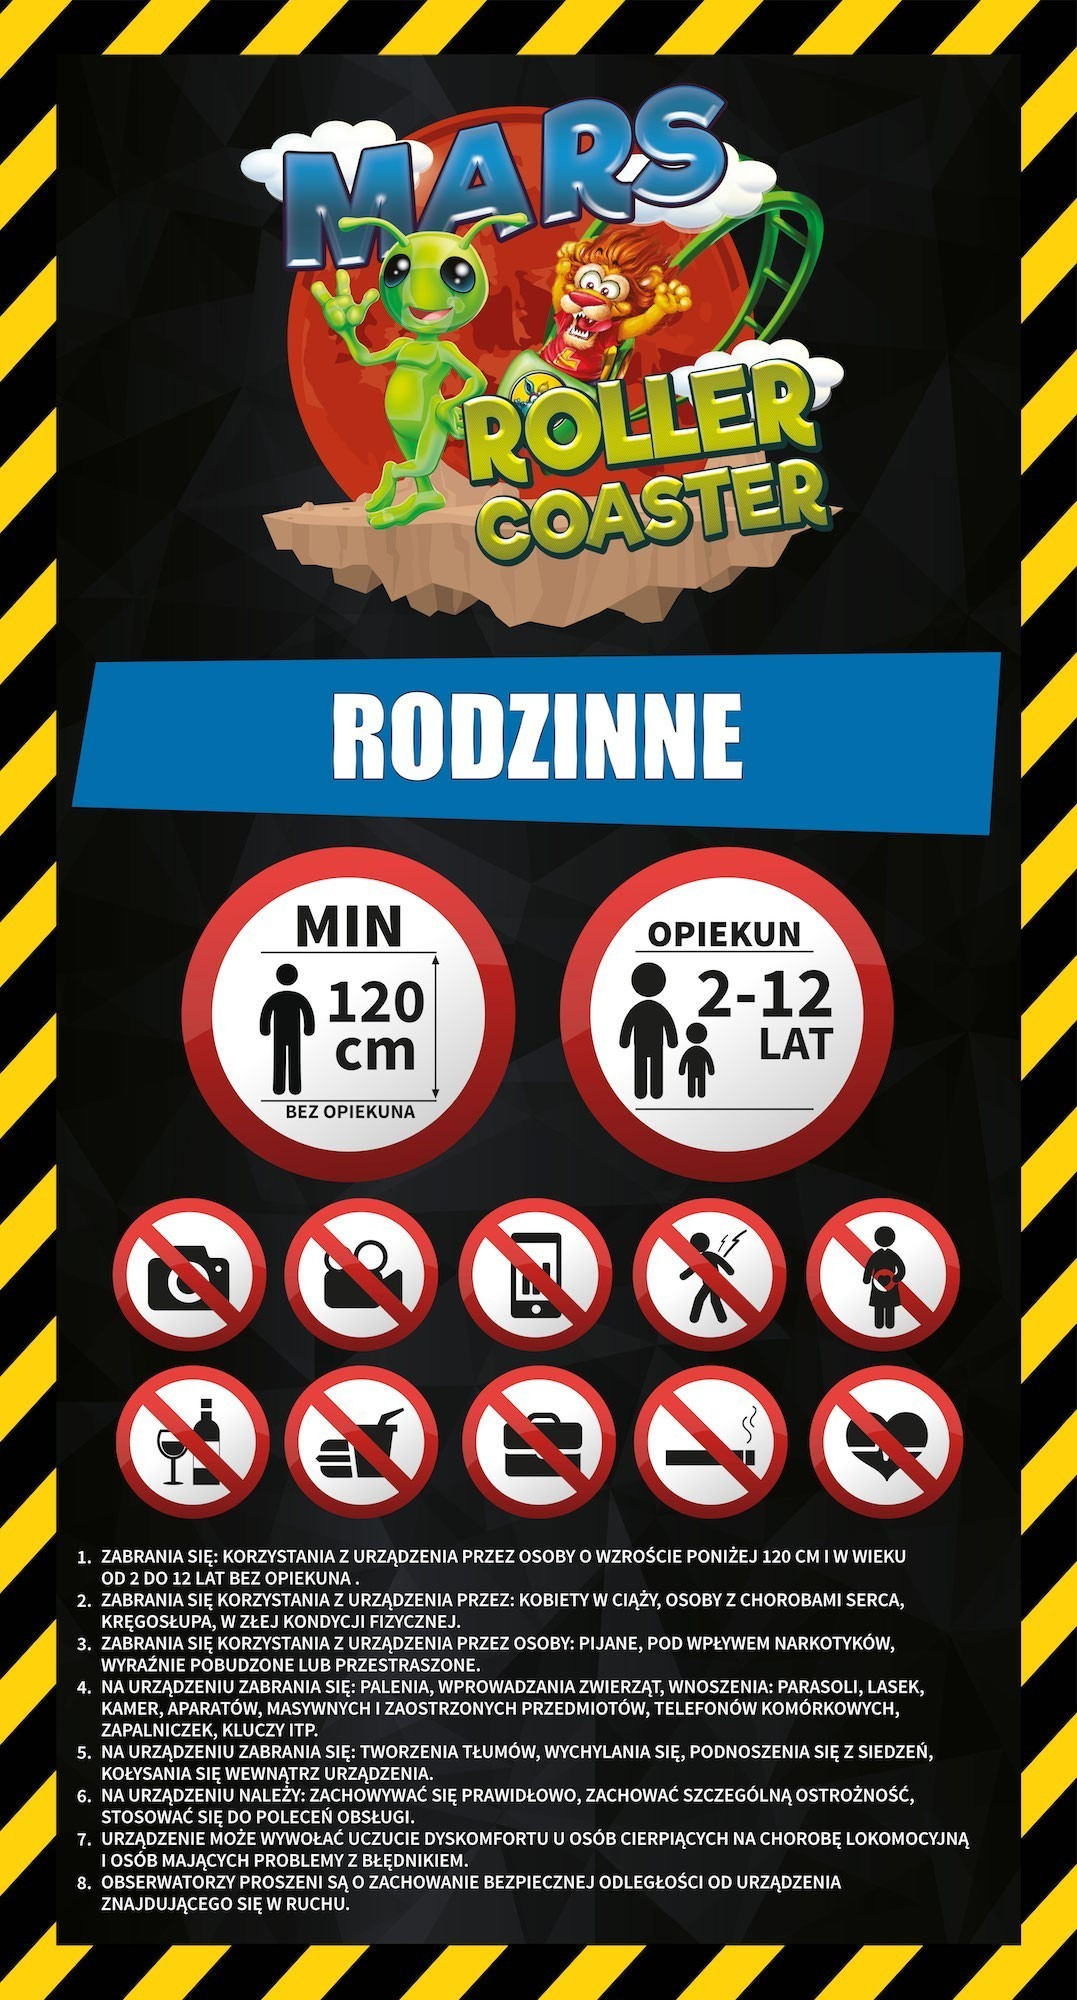 rodzinne-mars_roller_coaster